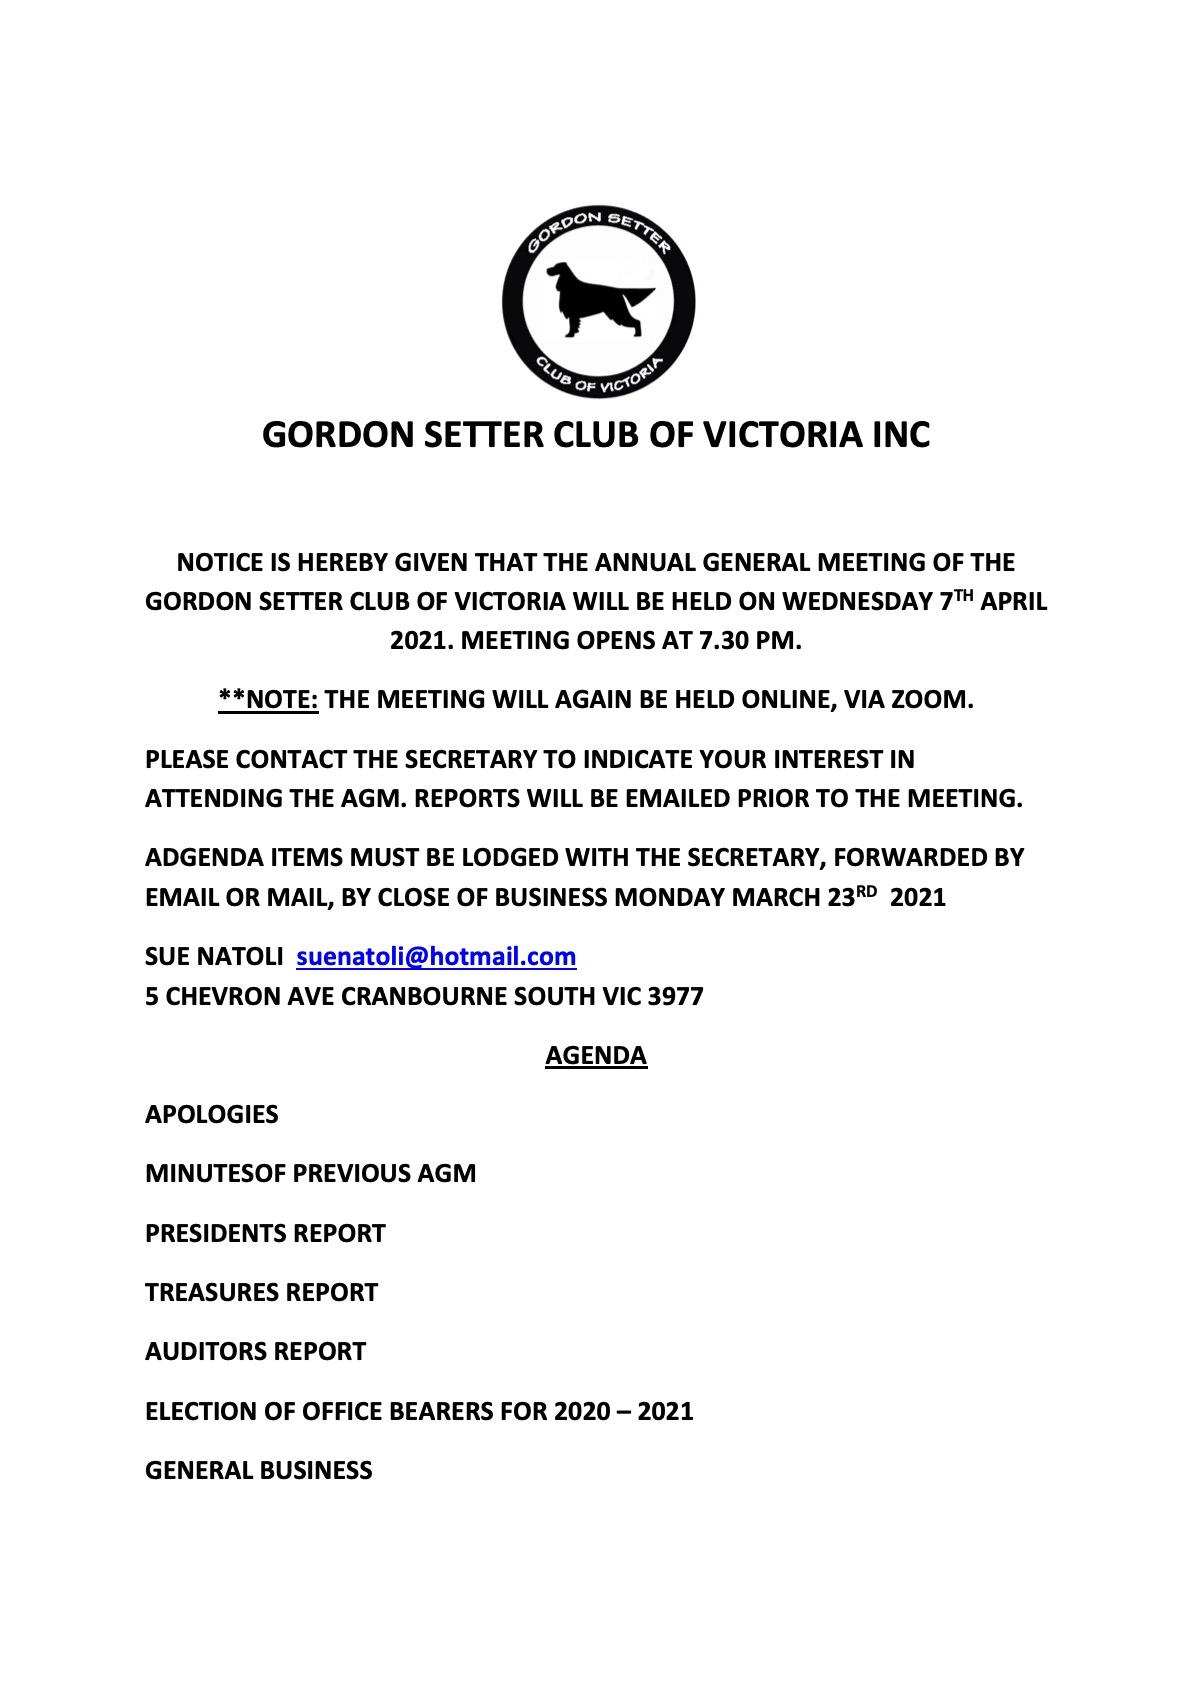 2021 AGM NOTIFICATION GORDON SETTER CLUB OF VICTORIA INC